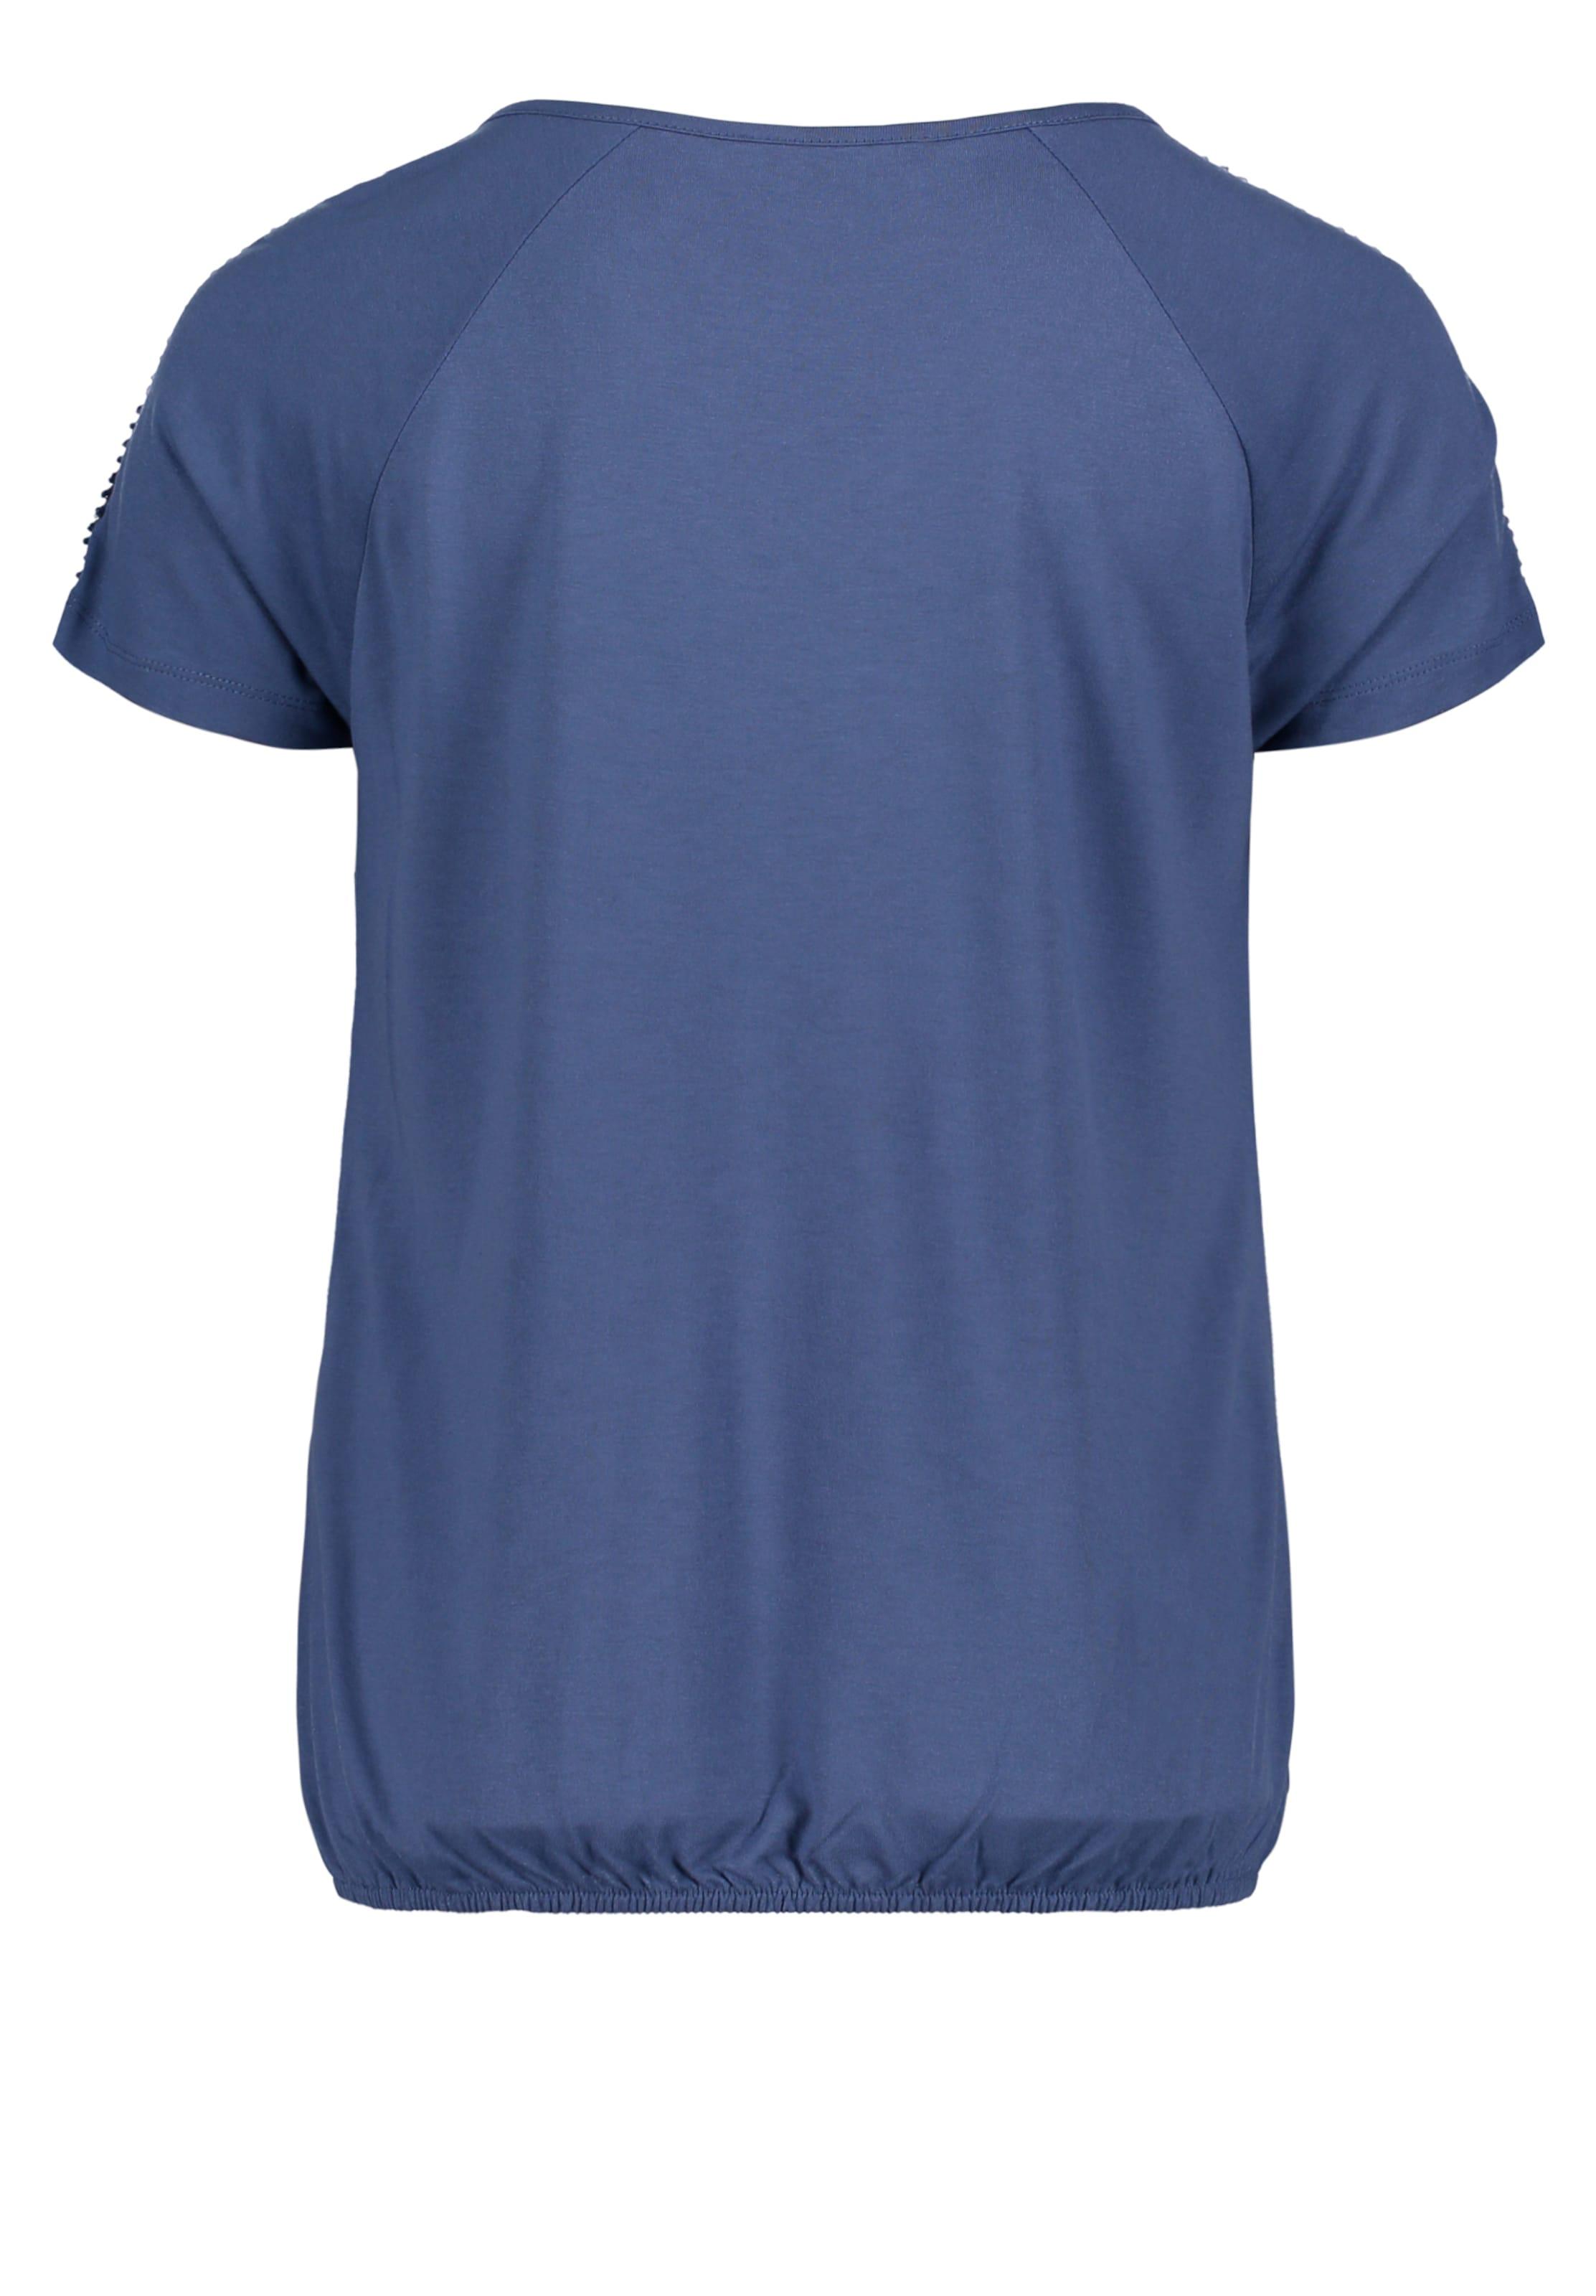 In In Barclay Barclay Dunkelblau Betty Dunkelblau Shirt Betty In Betty Barclay Shirt Shirt Yby6f7g